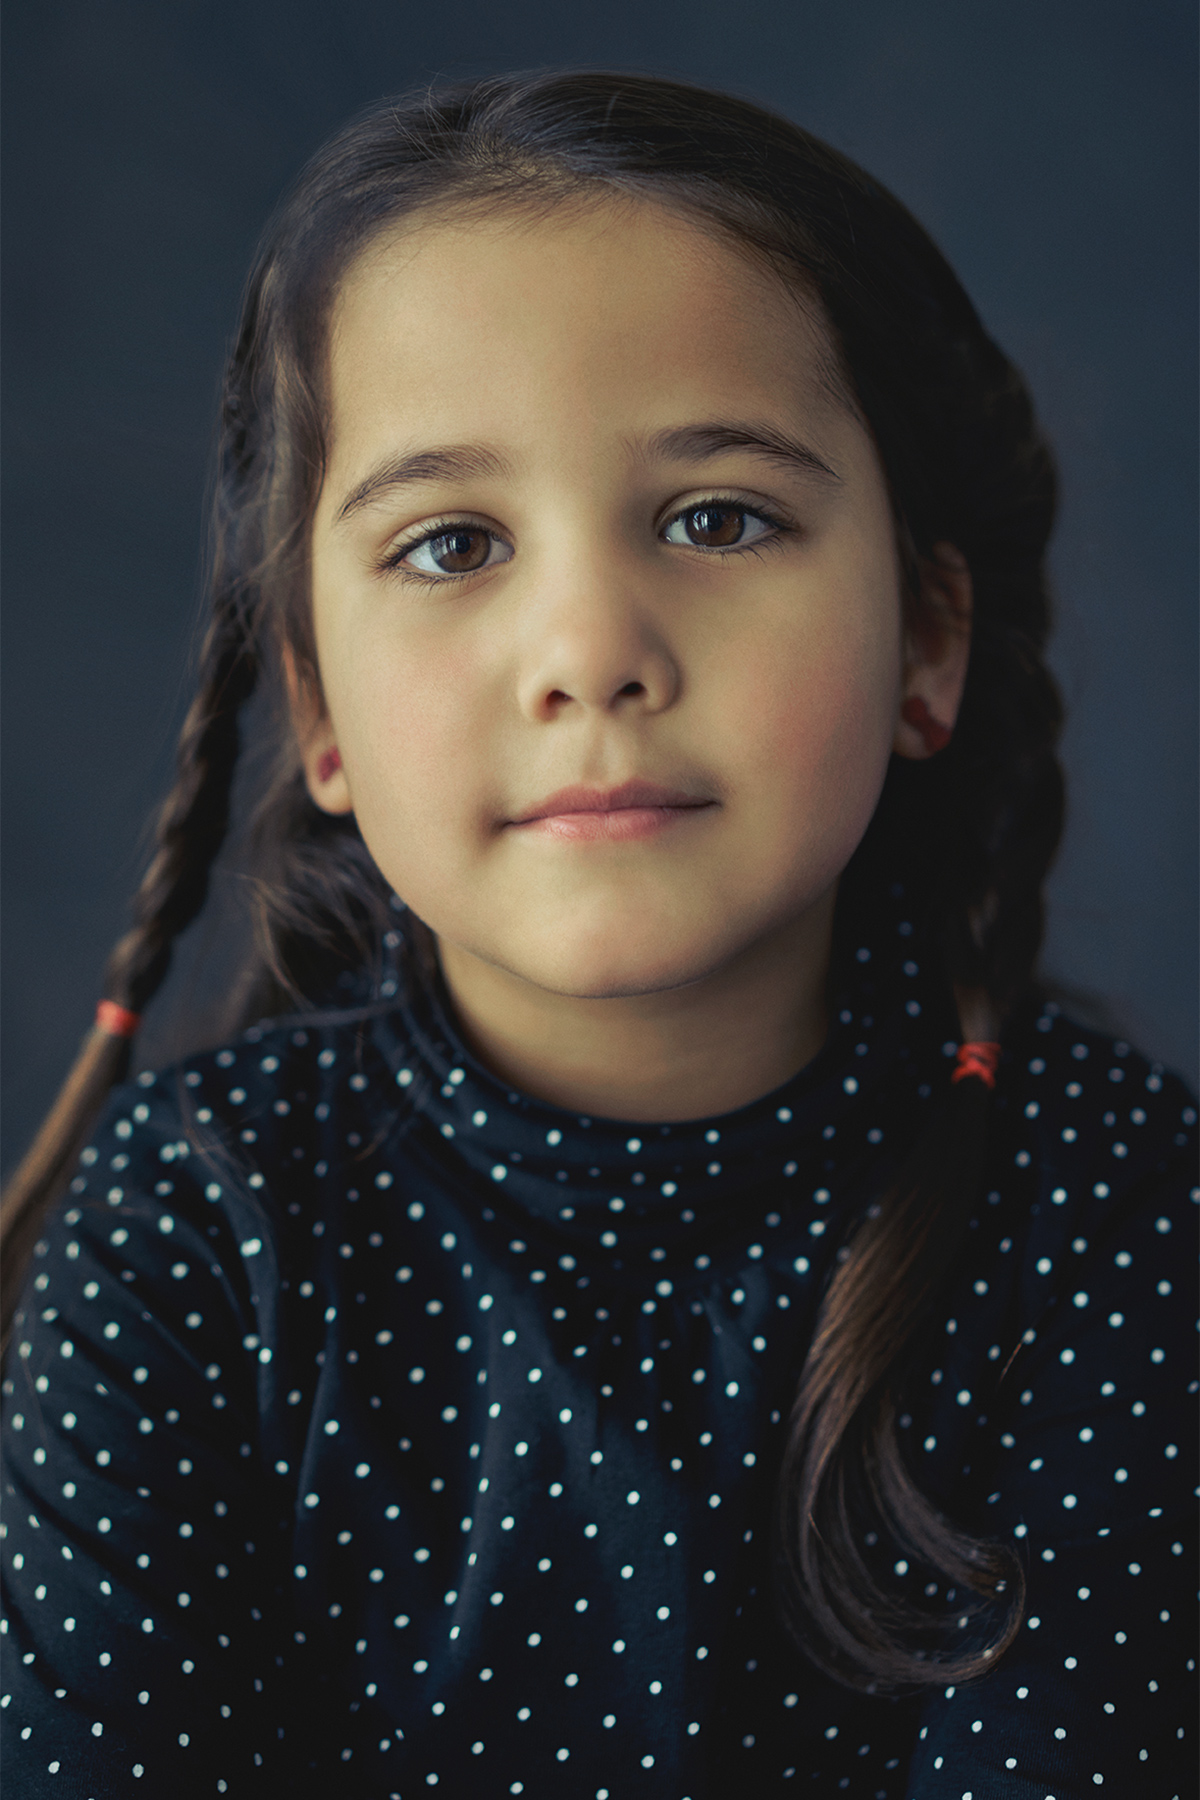 Kanaan-Kids,-Mönchengladbach,-27.12.2014_0-2